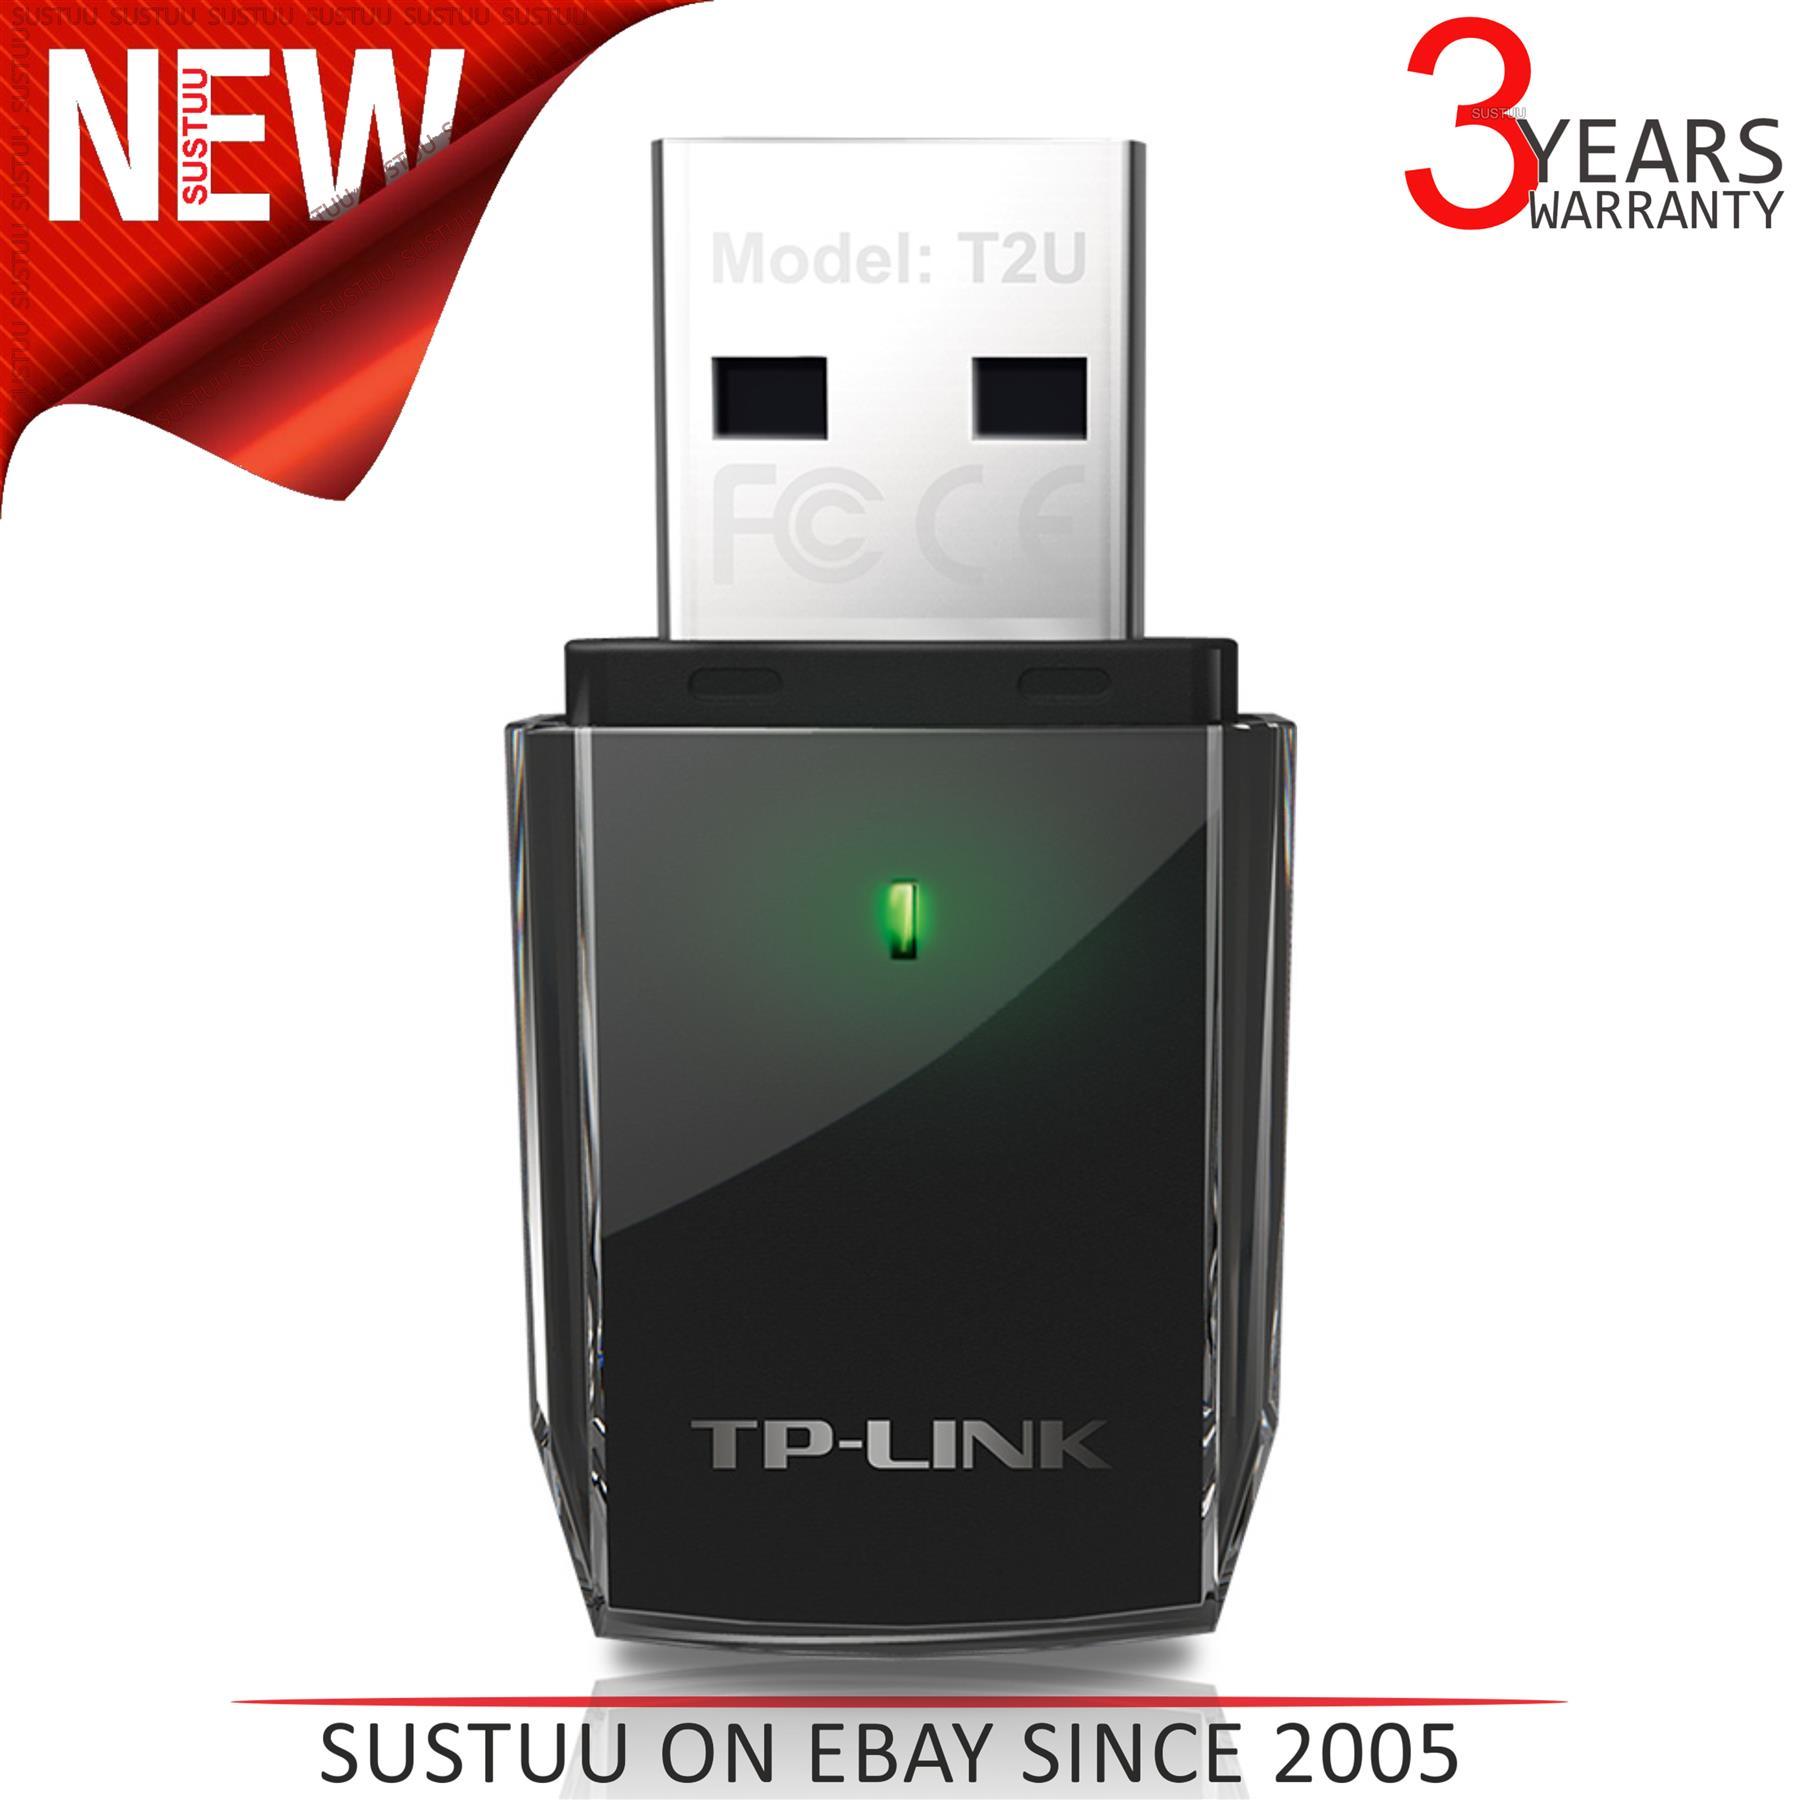 Dual Band 2.4G//5G AC600 Wireless N... TP-Link Archer T2U 11AC USB WiFi Adapter